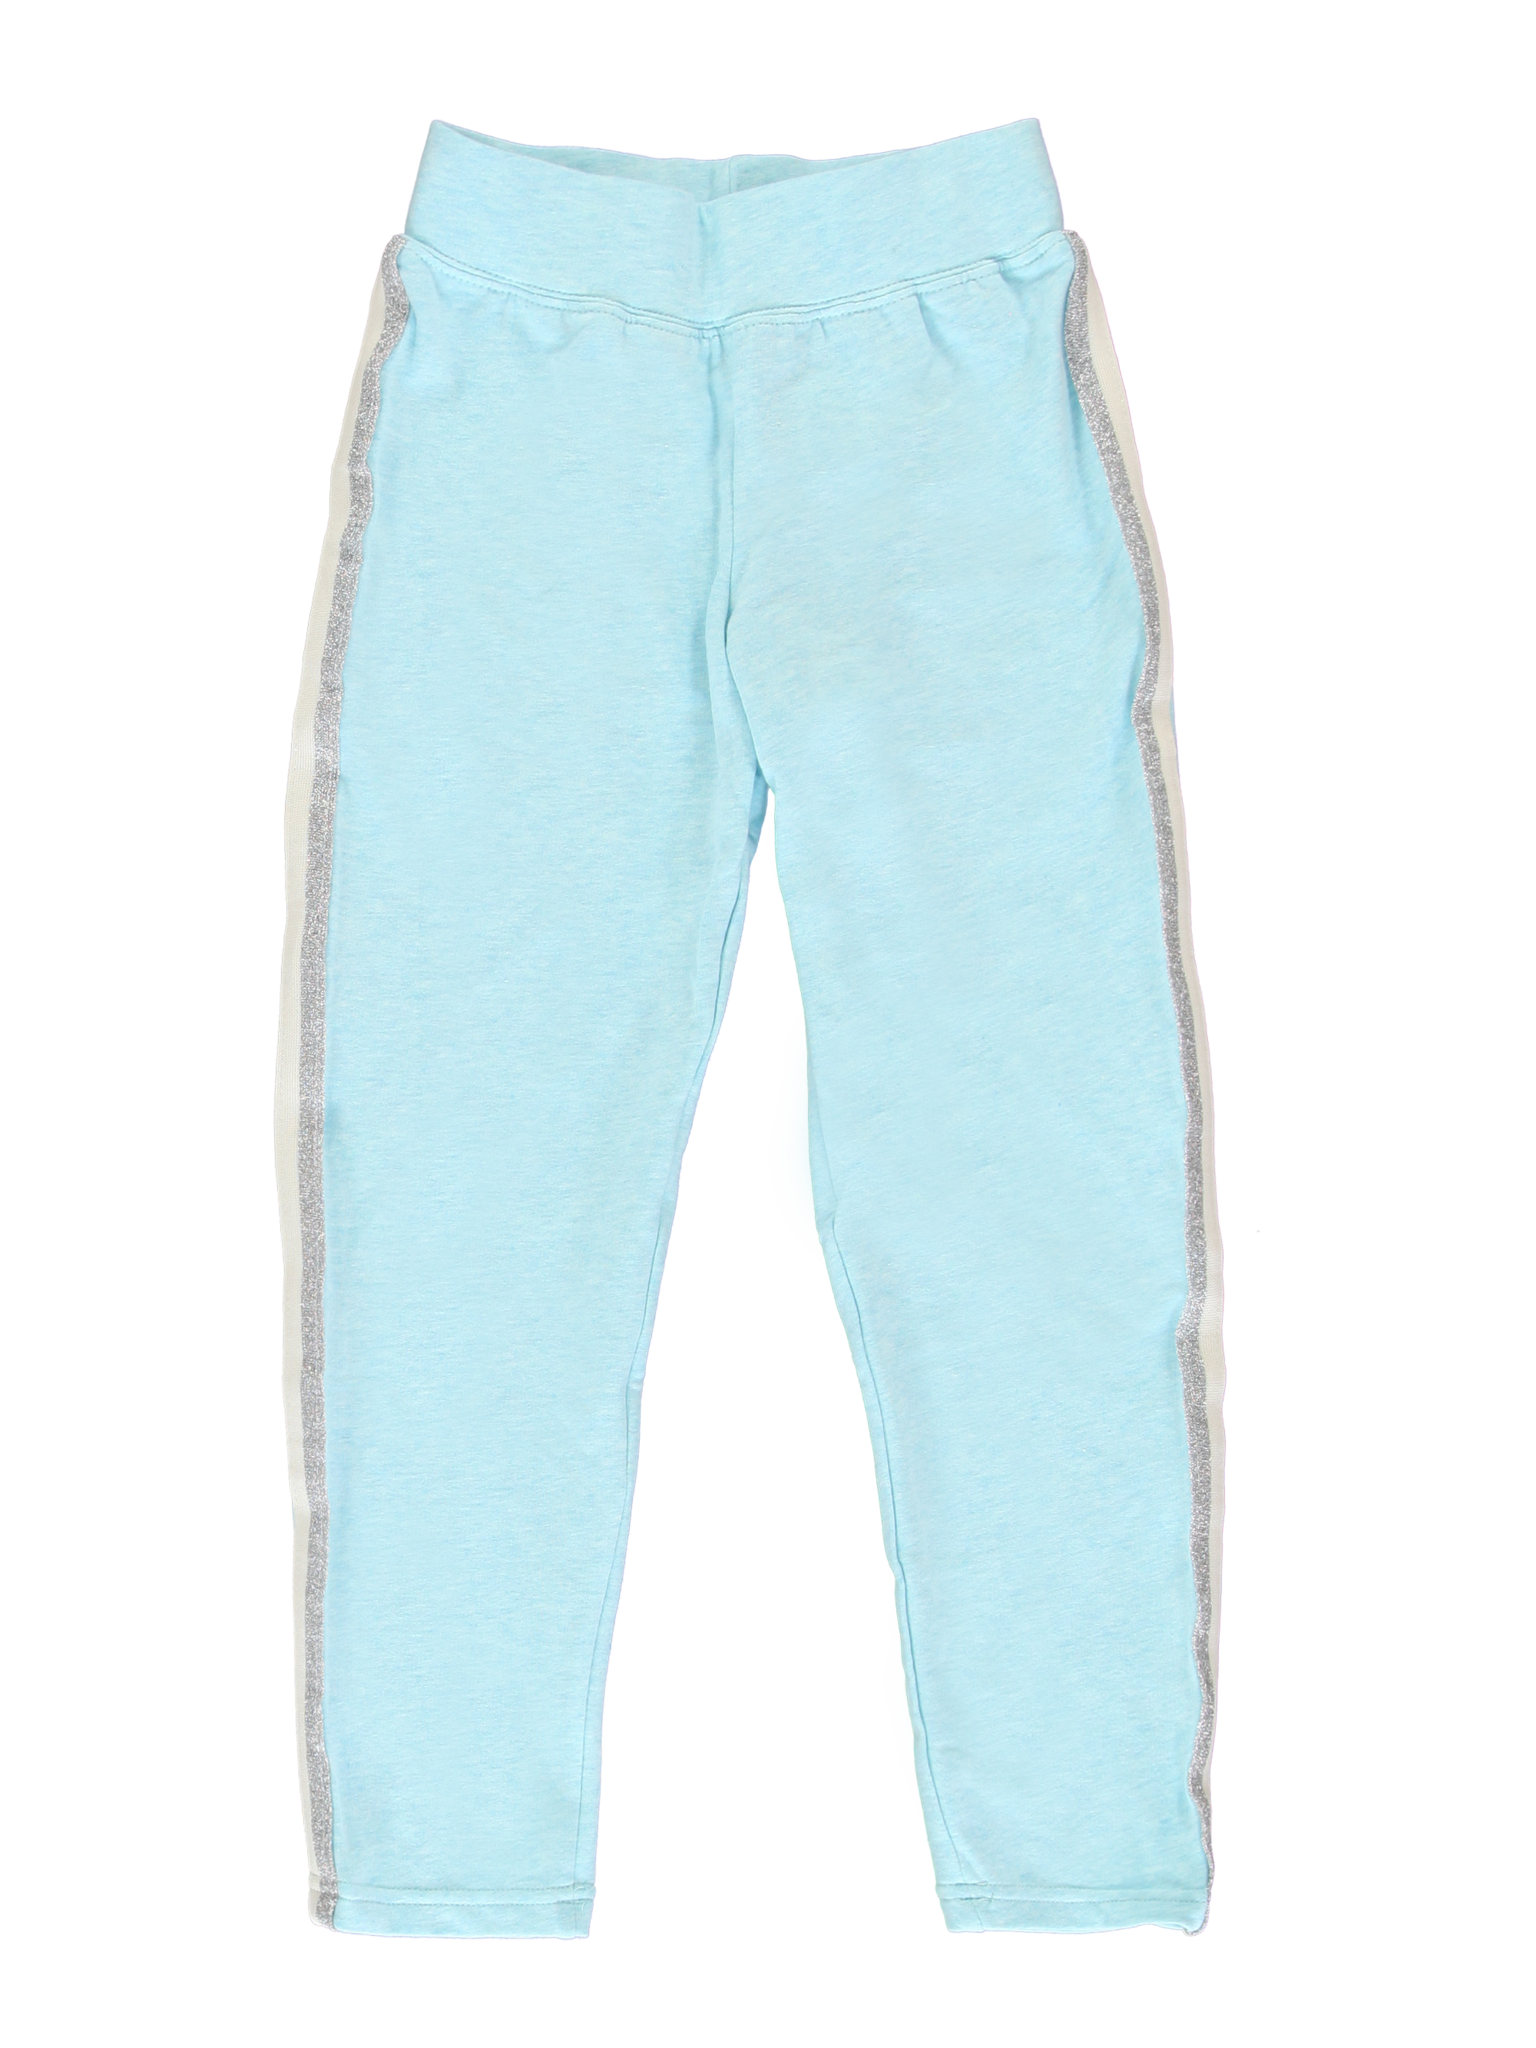 All Brands | Summerproducts Small Girls | Jogging Pant | 10 pcs/box